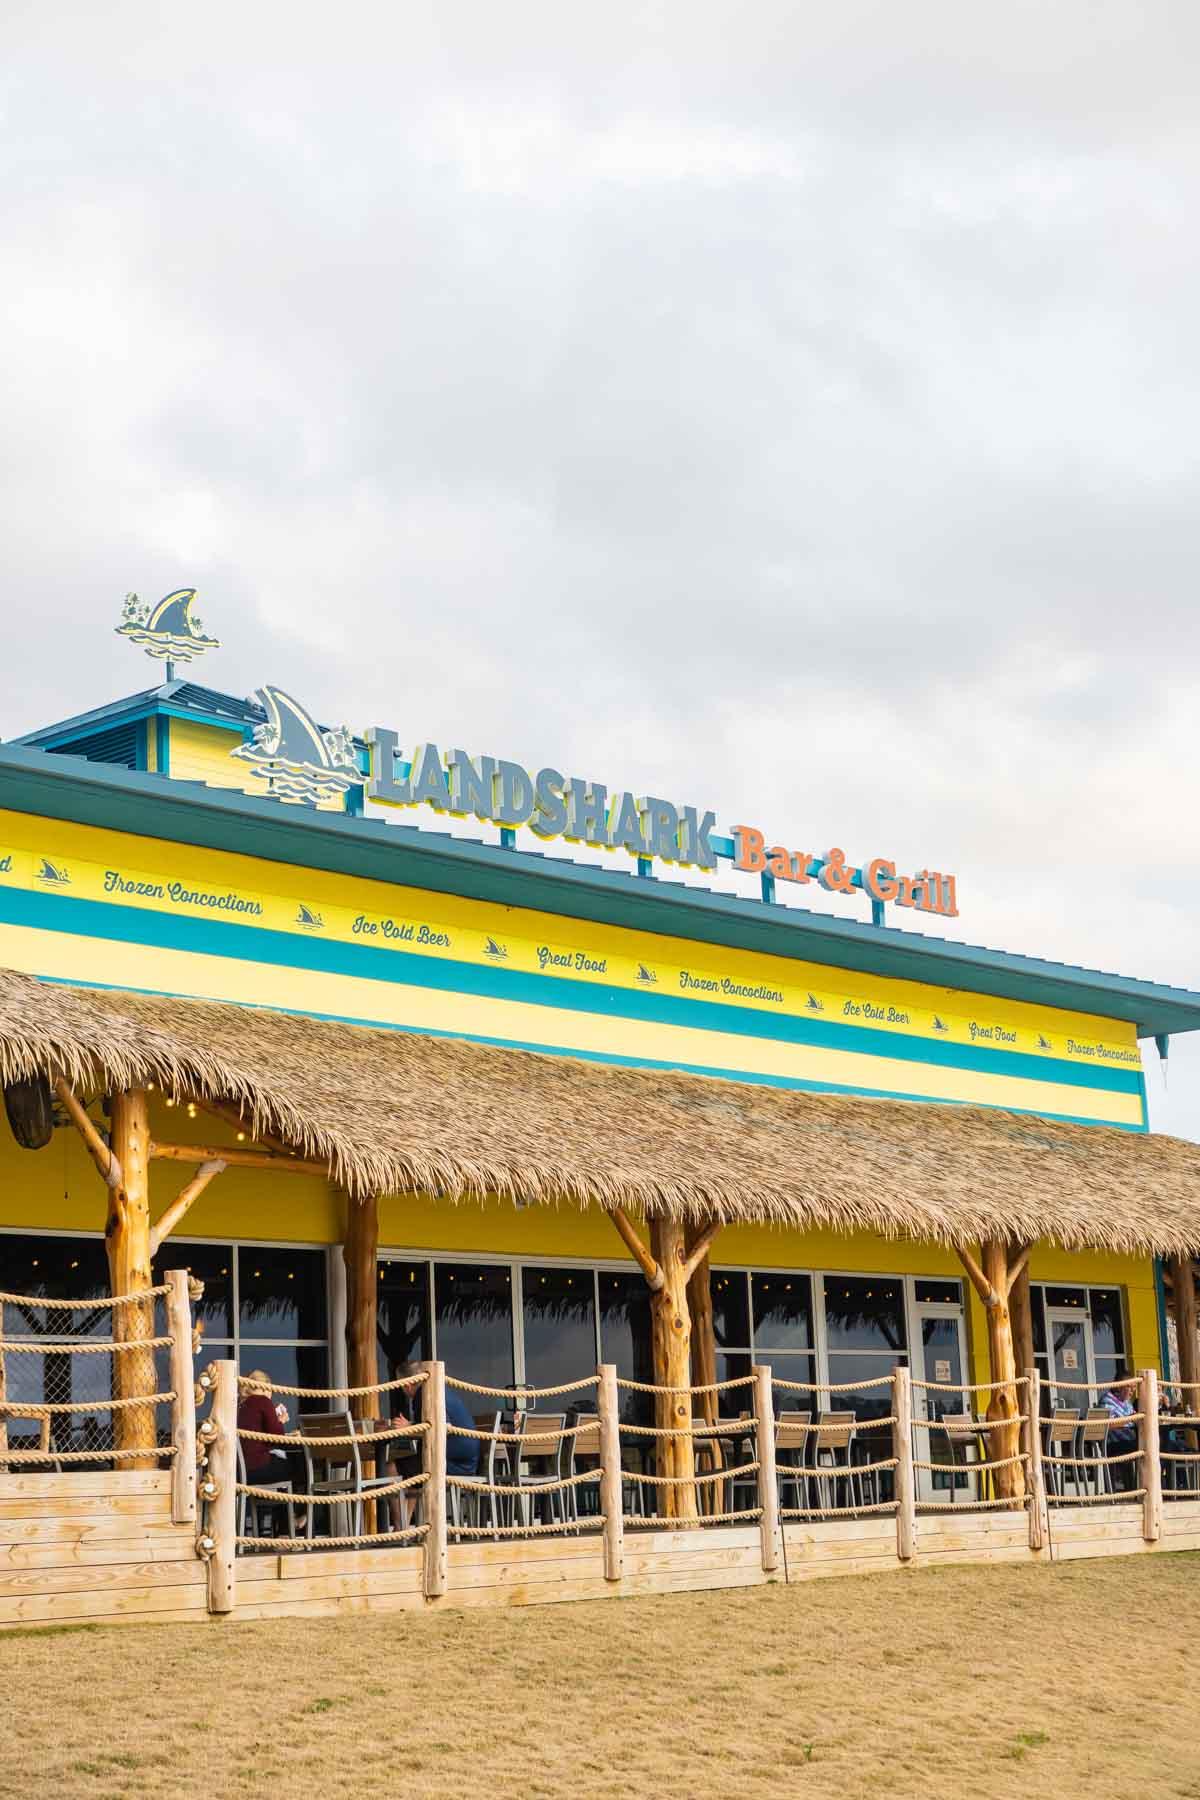 Landshark Bar and Grill at Margaritaville Lake Conroe